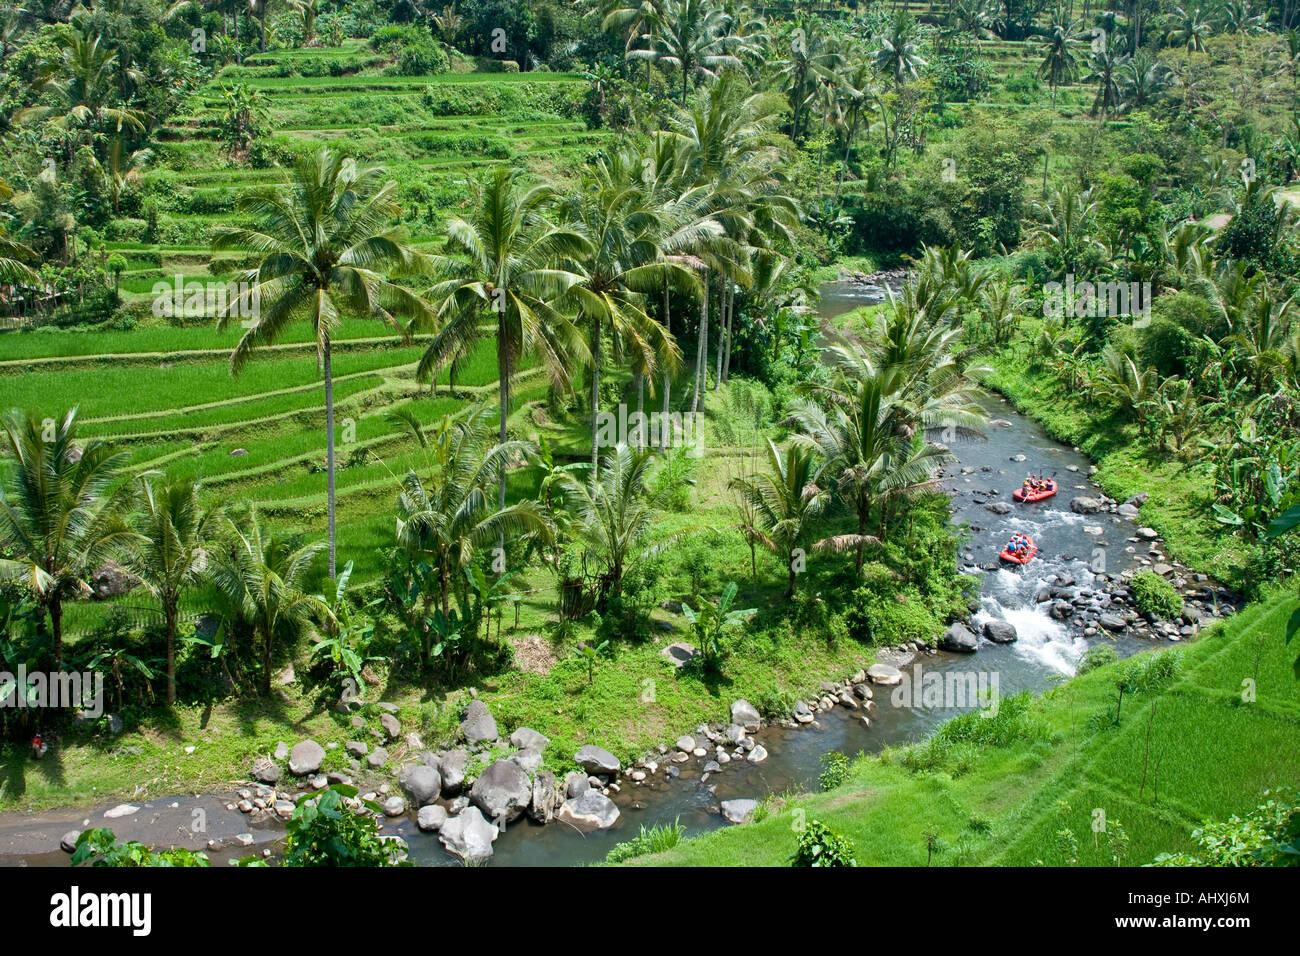 Rafting Ayung River Gorge Rice Terraces Ubud Bali Indonesia Stock Photo Alamy